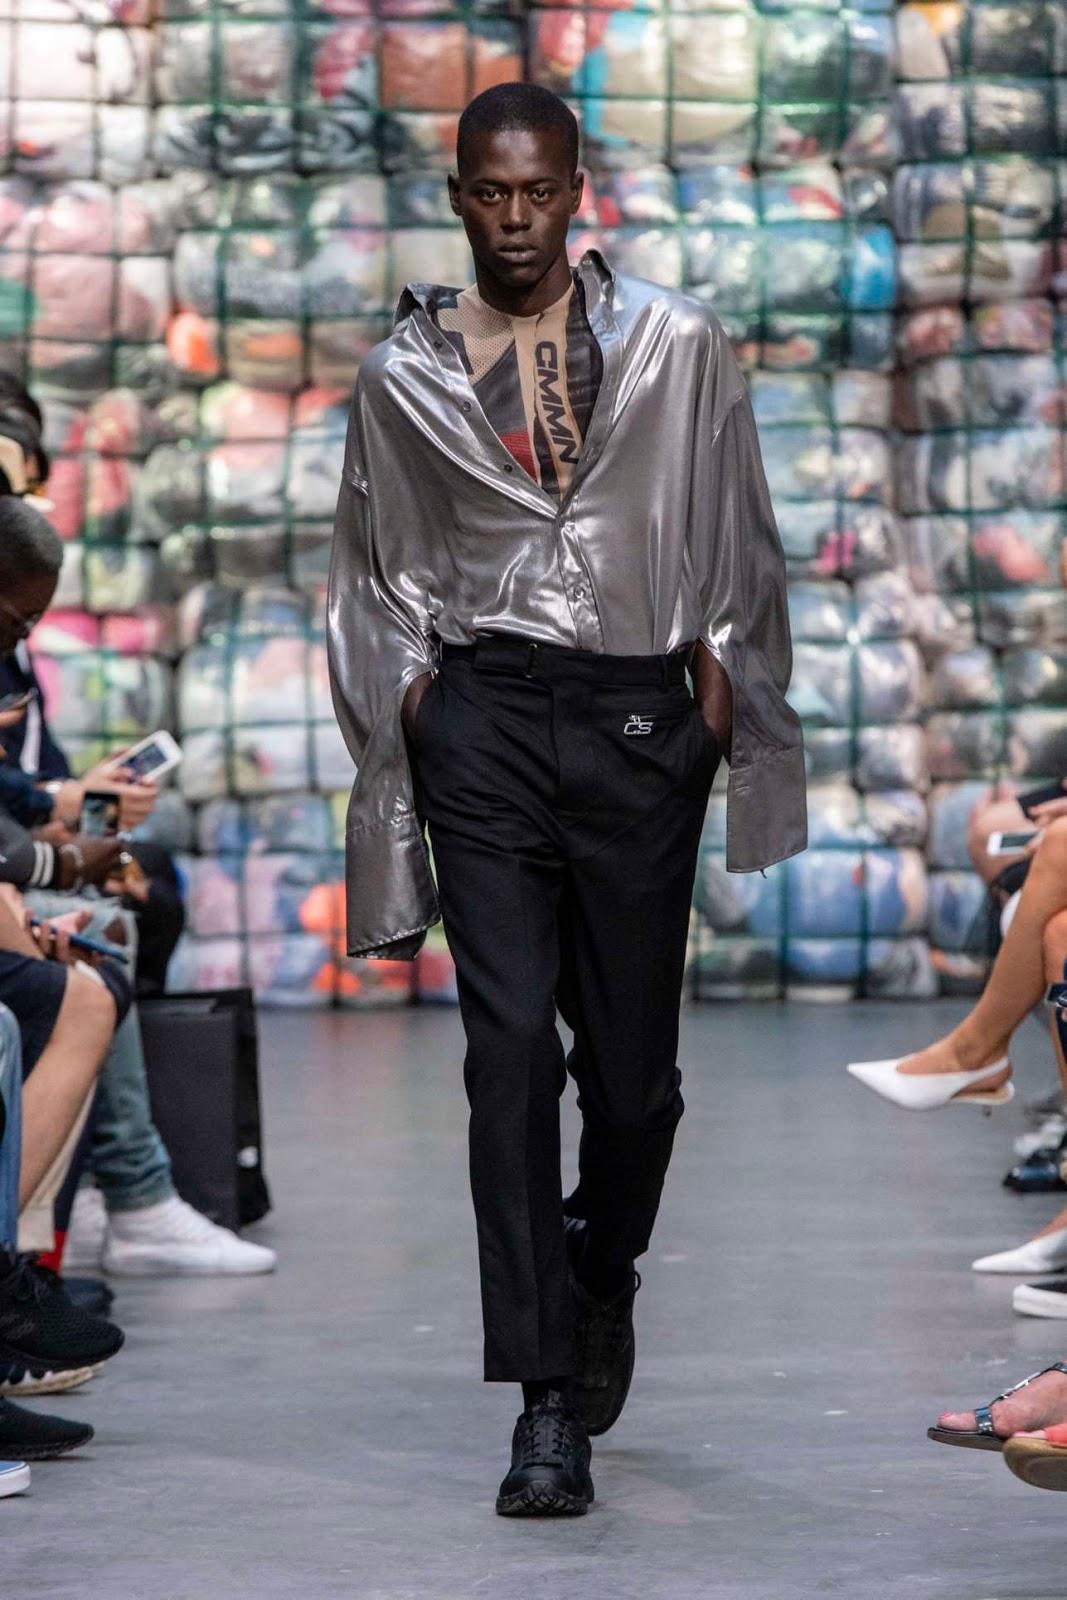 CMMN SWDN Spring-Summer 2019 - Paris Fashion Week